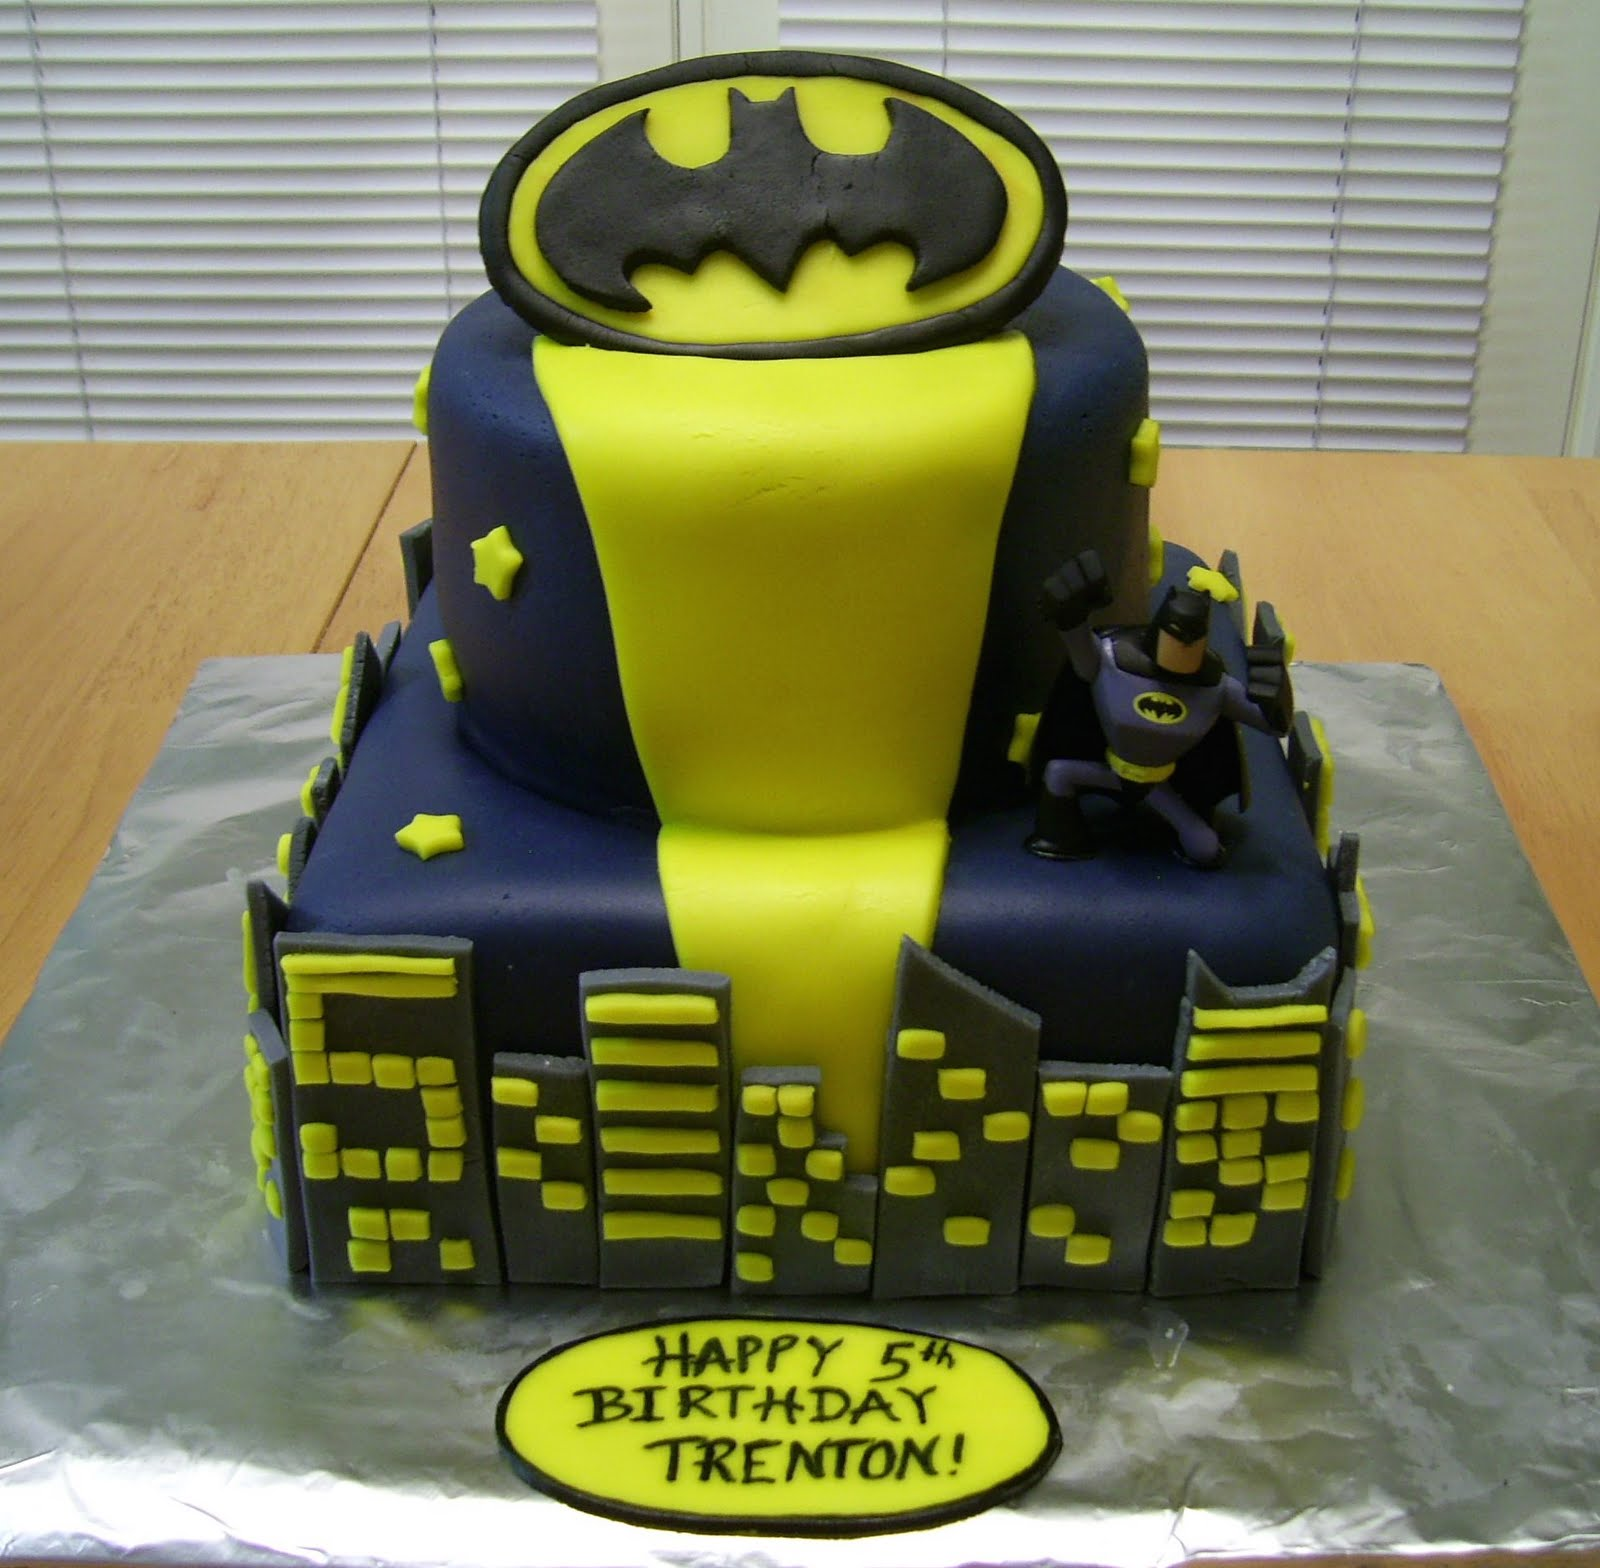 Bellissimo Specialty Cakes Batman Birthday Cake 1 10